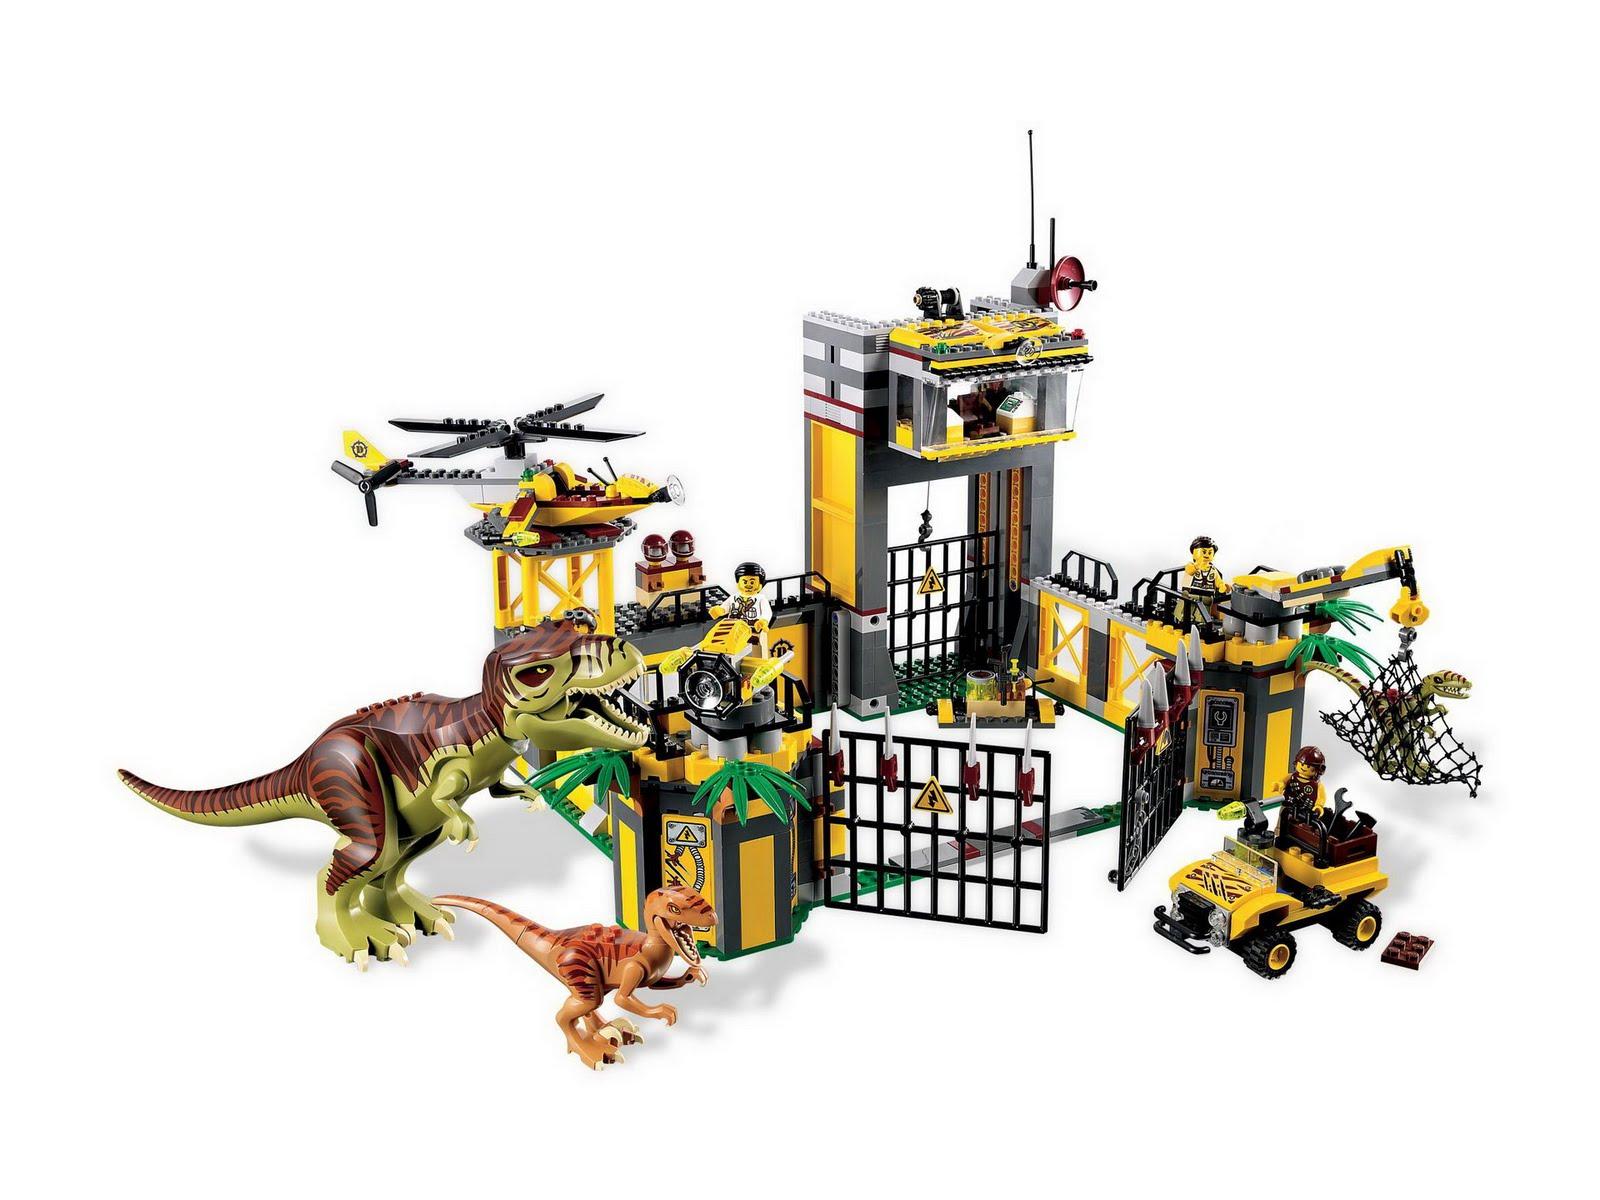 Repubblick set database lego 5887 dino defense hq - Lego dinosaures ...